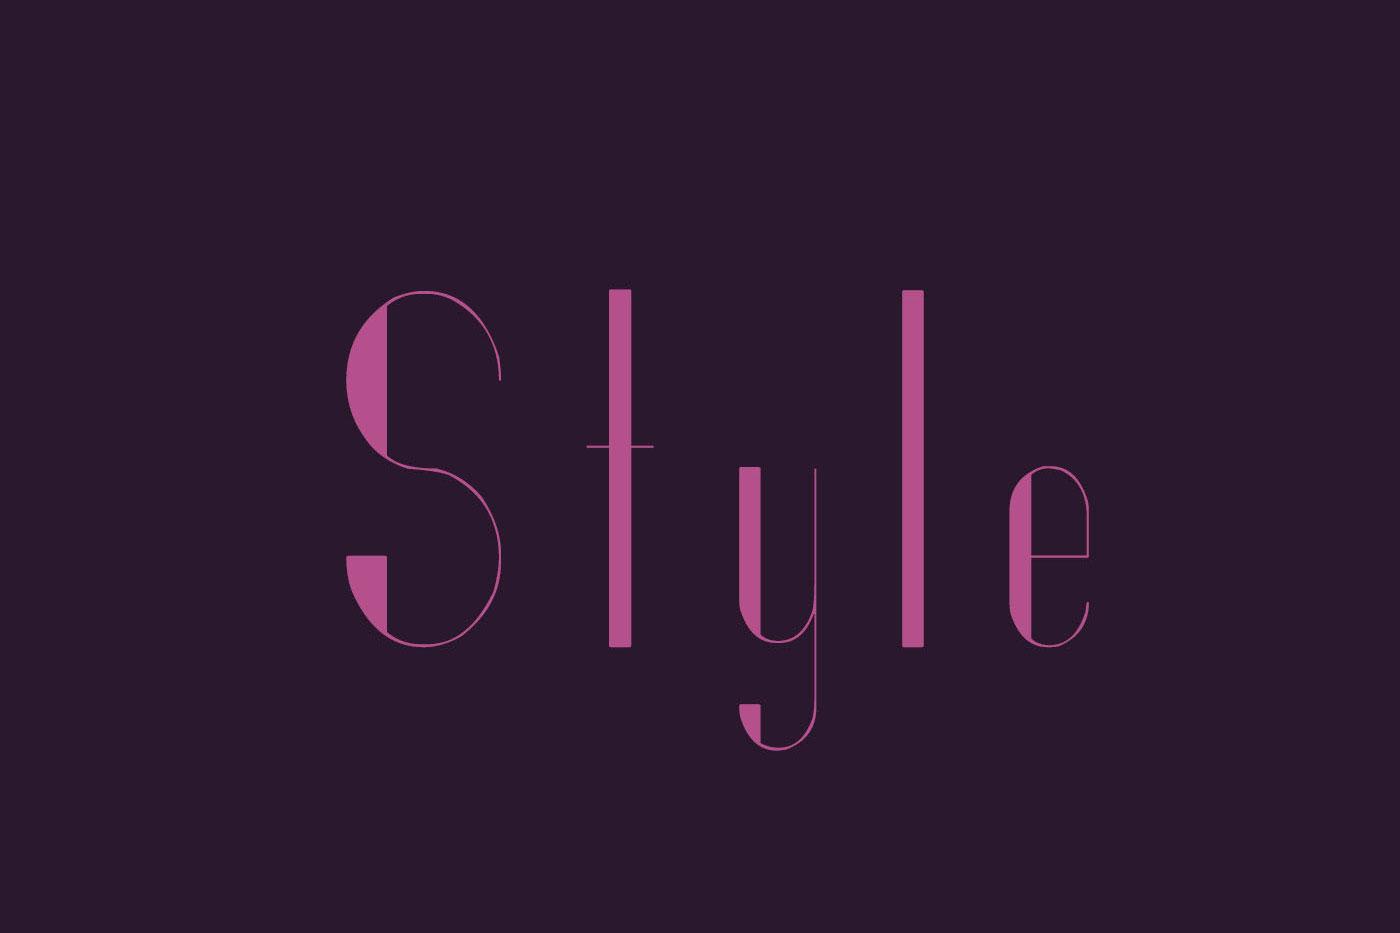 Styllo Display Typeface example image 6